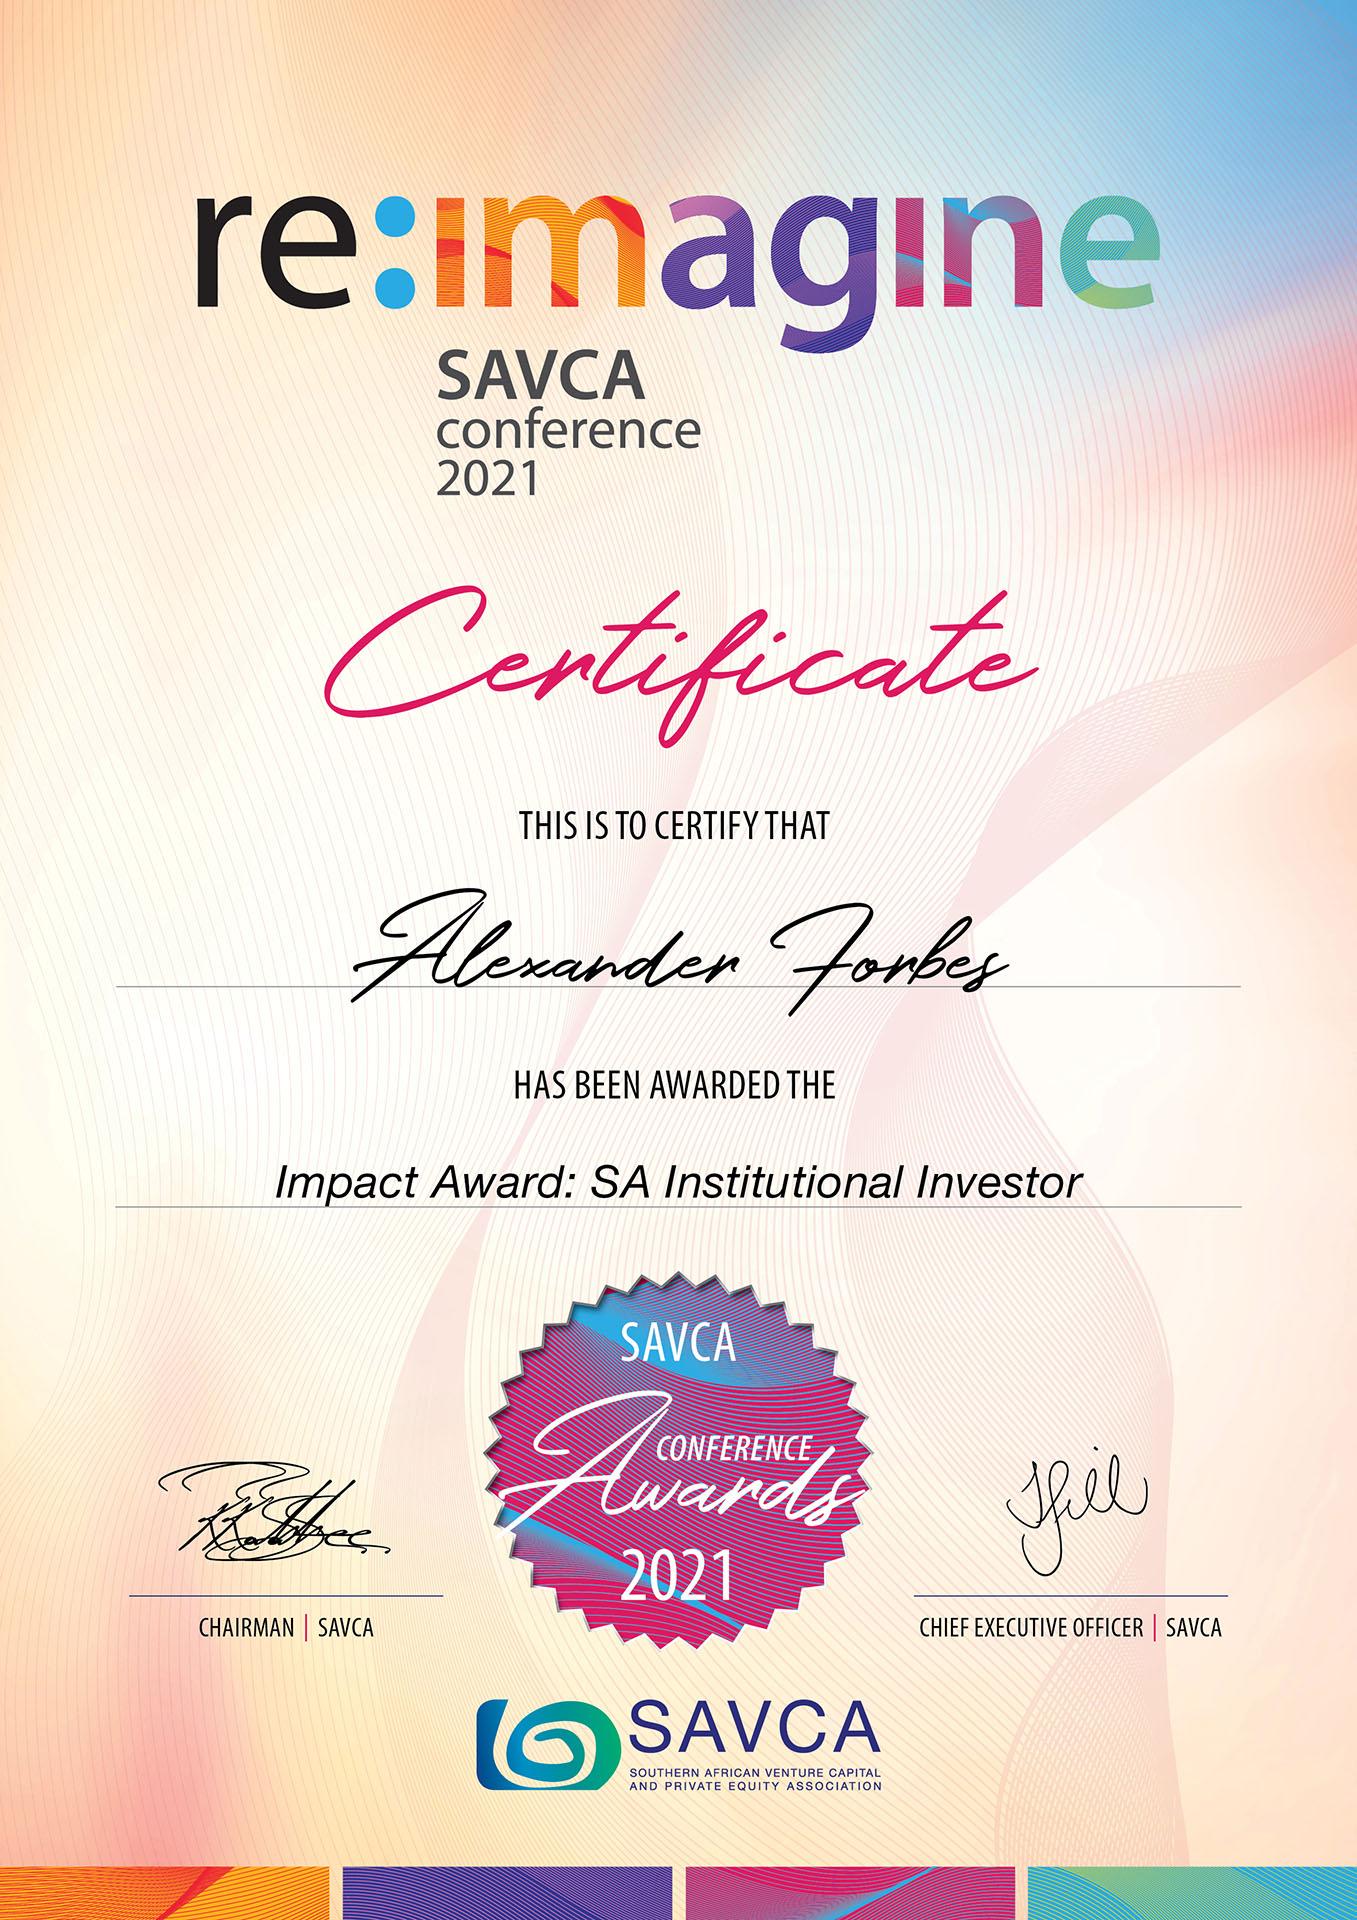 SAVCA-Conference-Award-2021-Winner-Alexander-Forbes